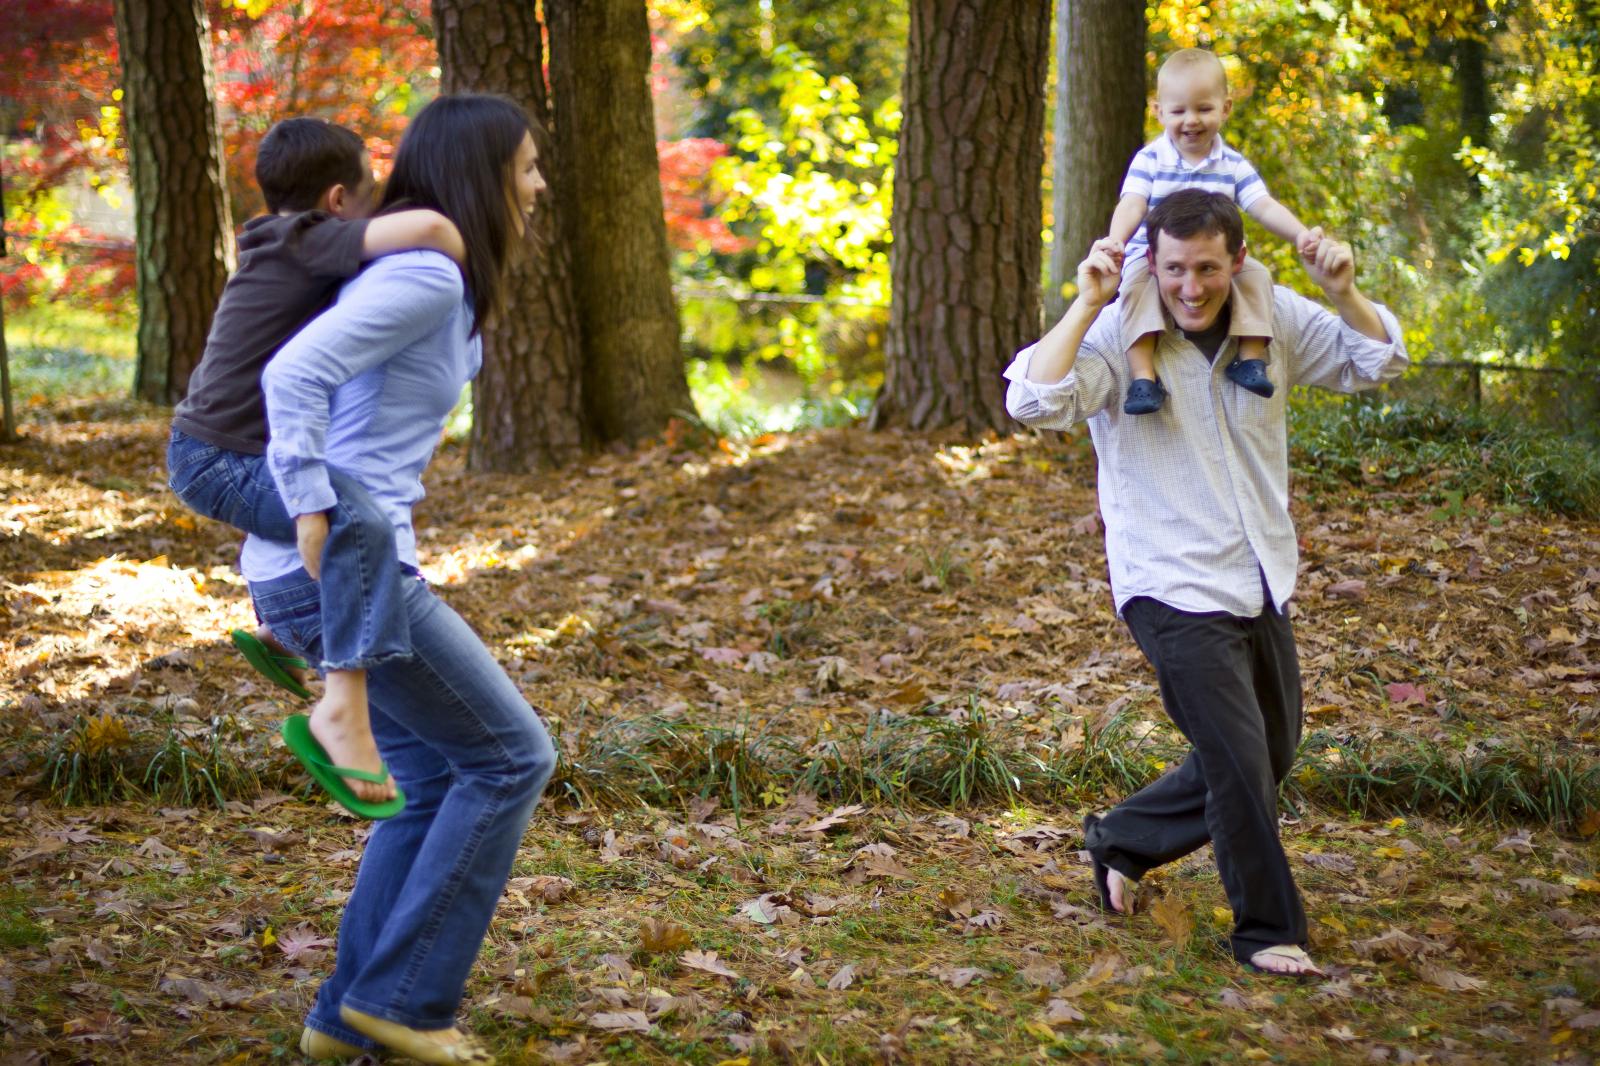 Outdoor activites for children